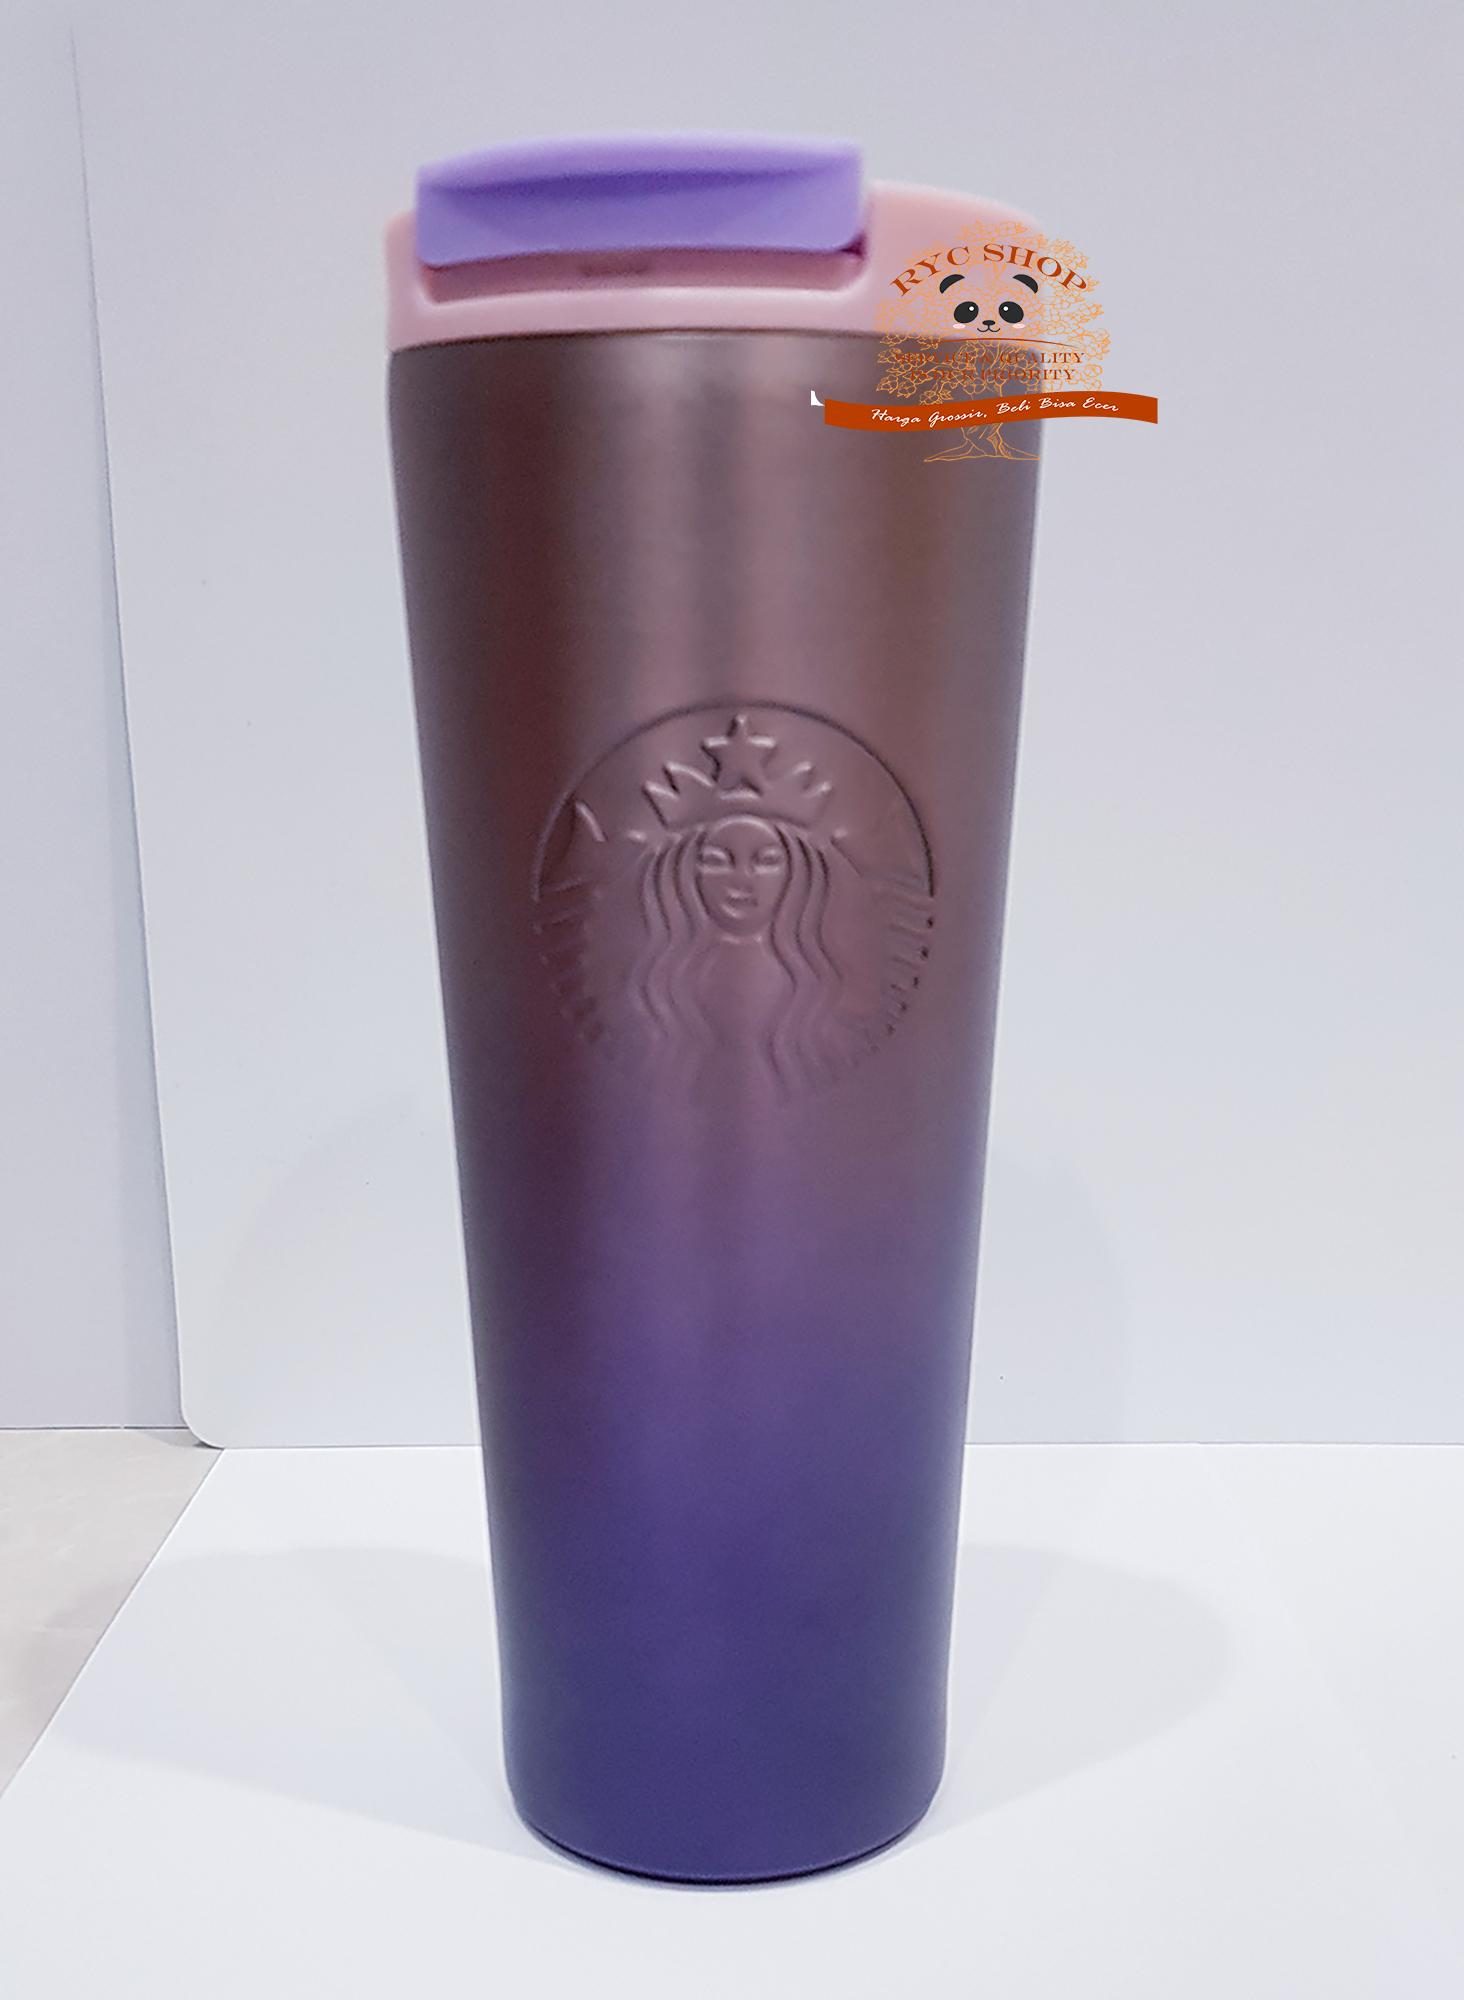 Jual Produk Starbucks Terbaru | Lazada.co.id